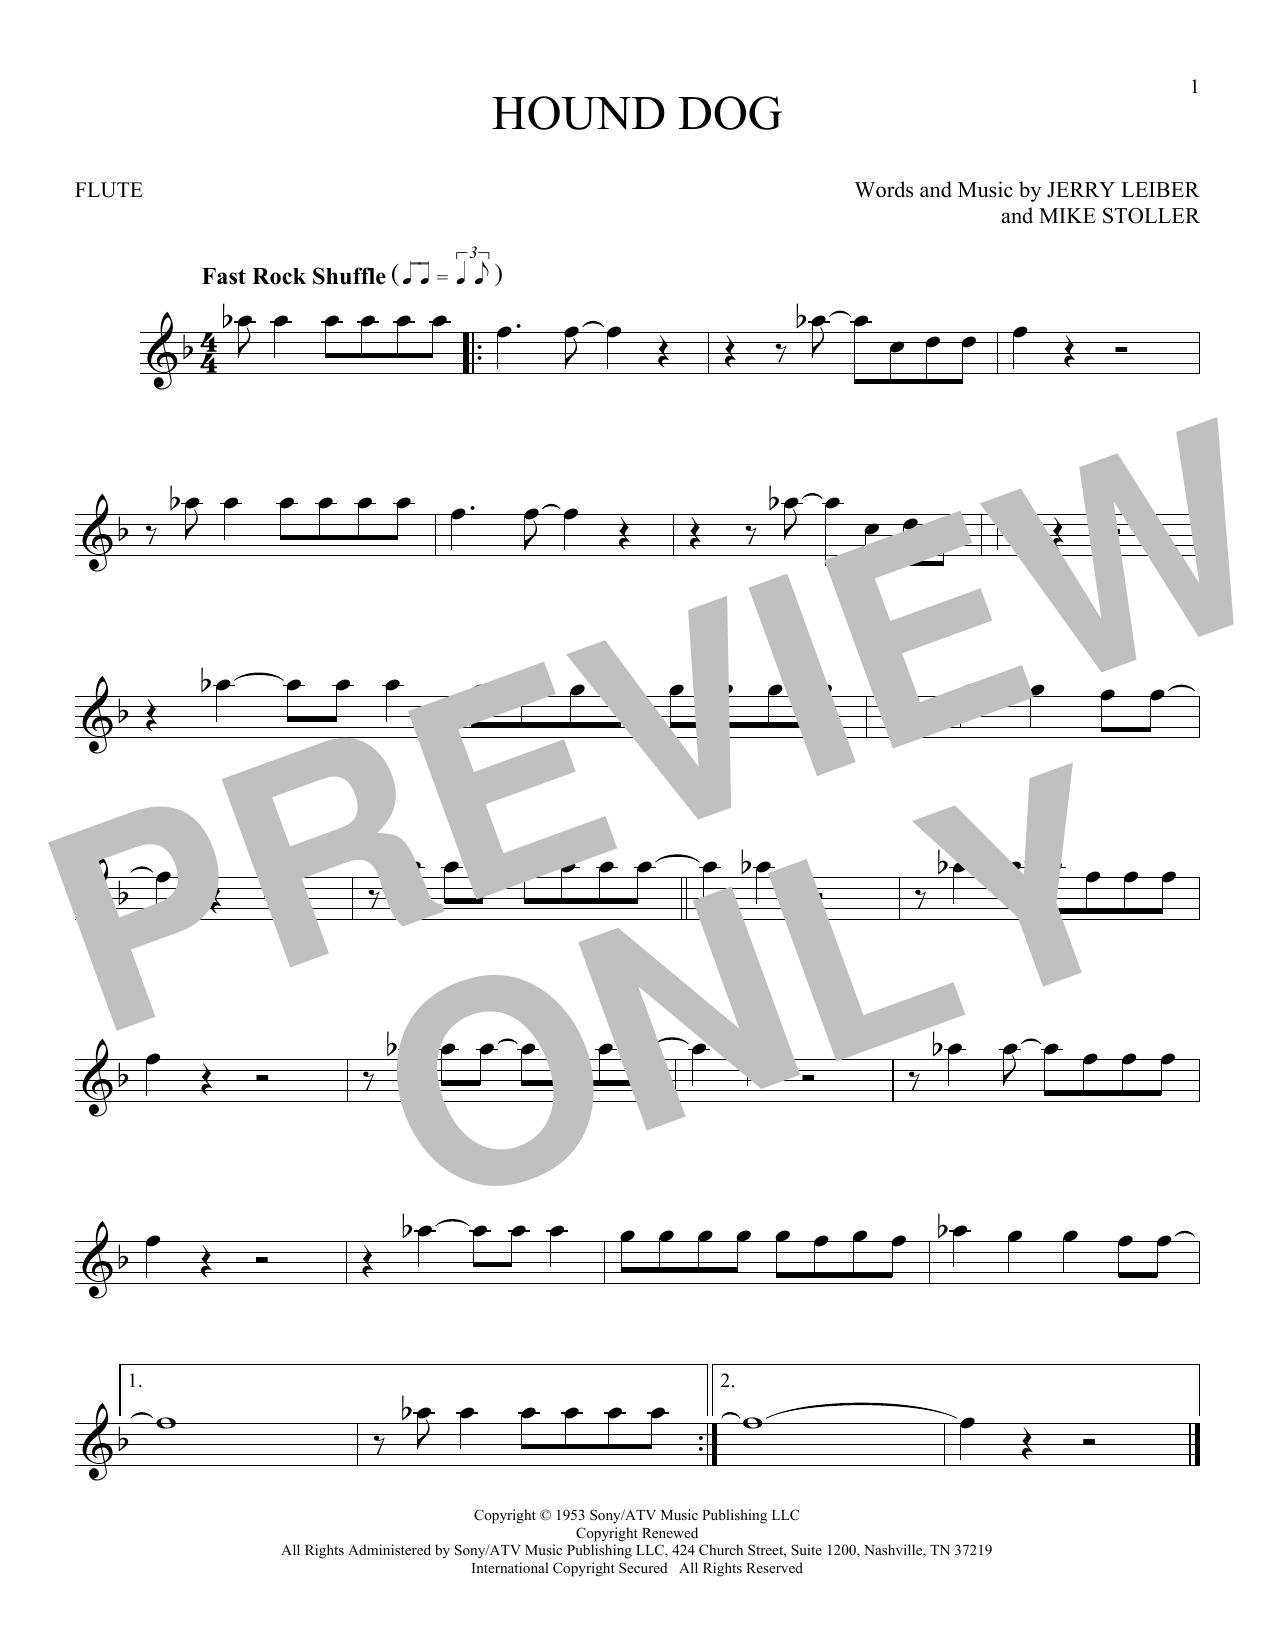 Hound Dog (Flute Solo)